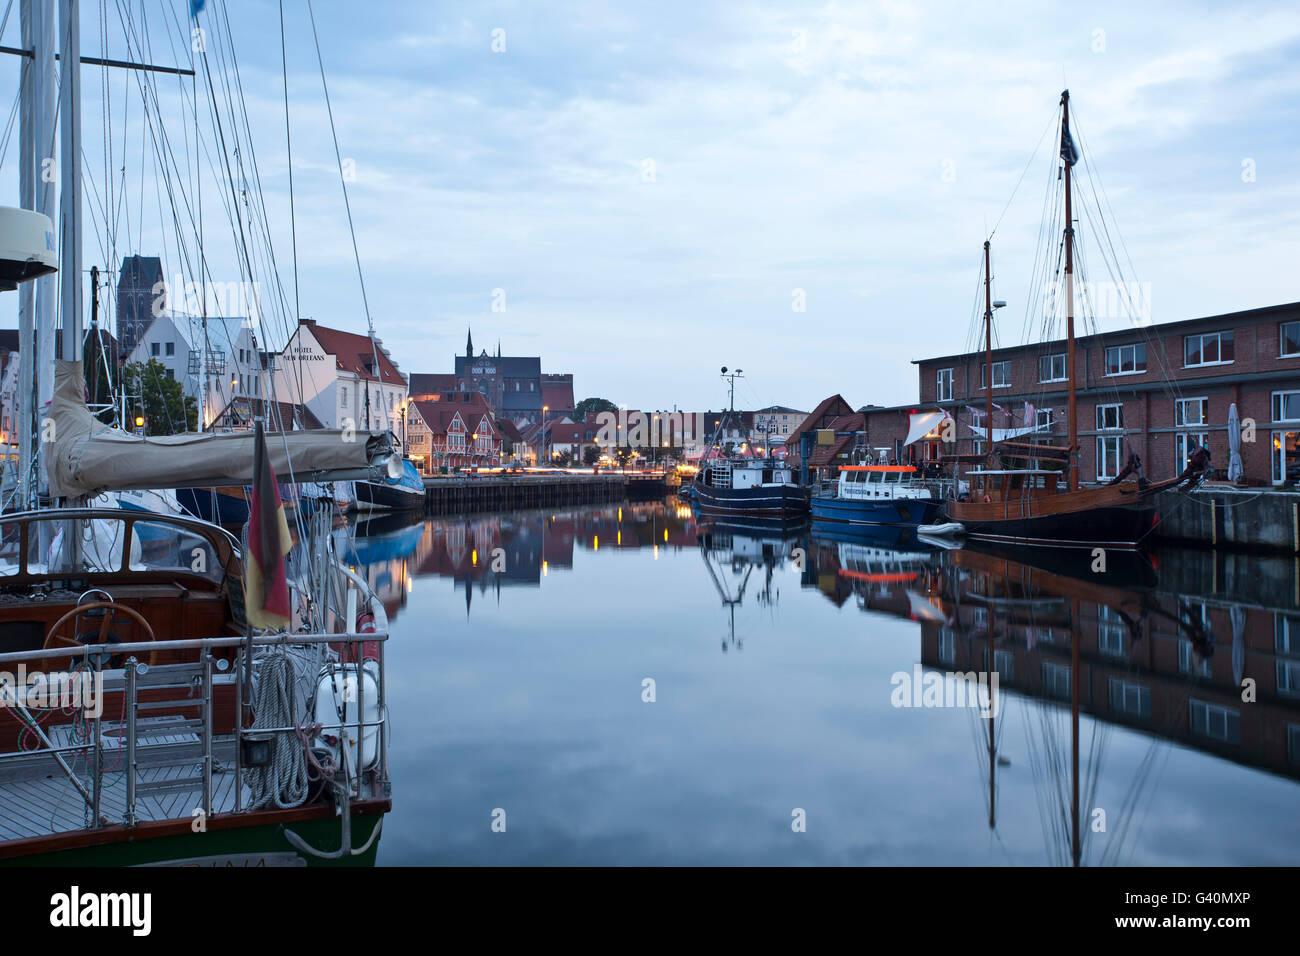 Old port, Wismar, Mecklenburg-Western Pomerania - Stock Image